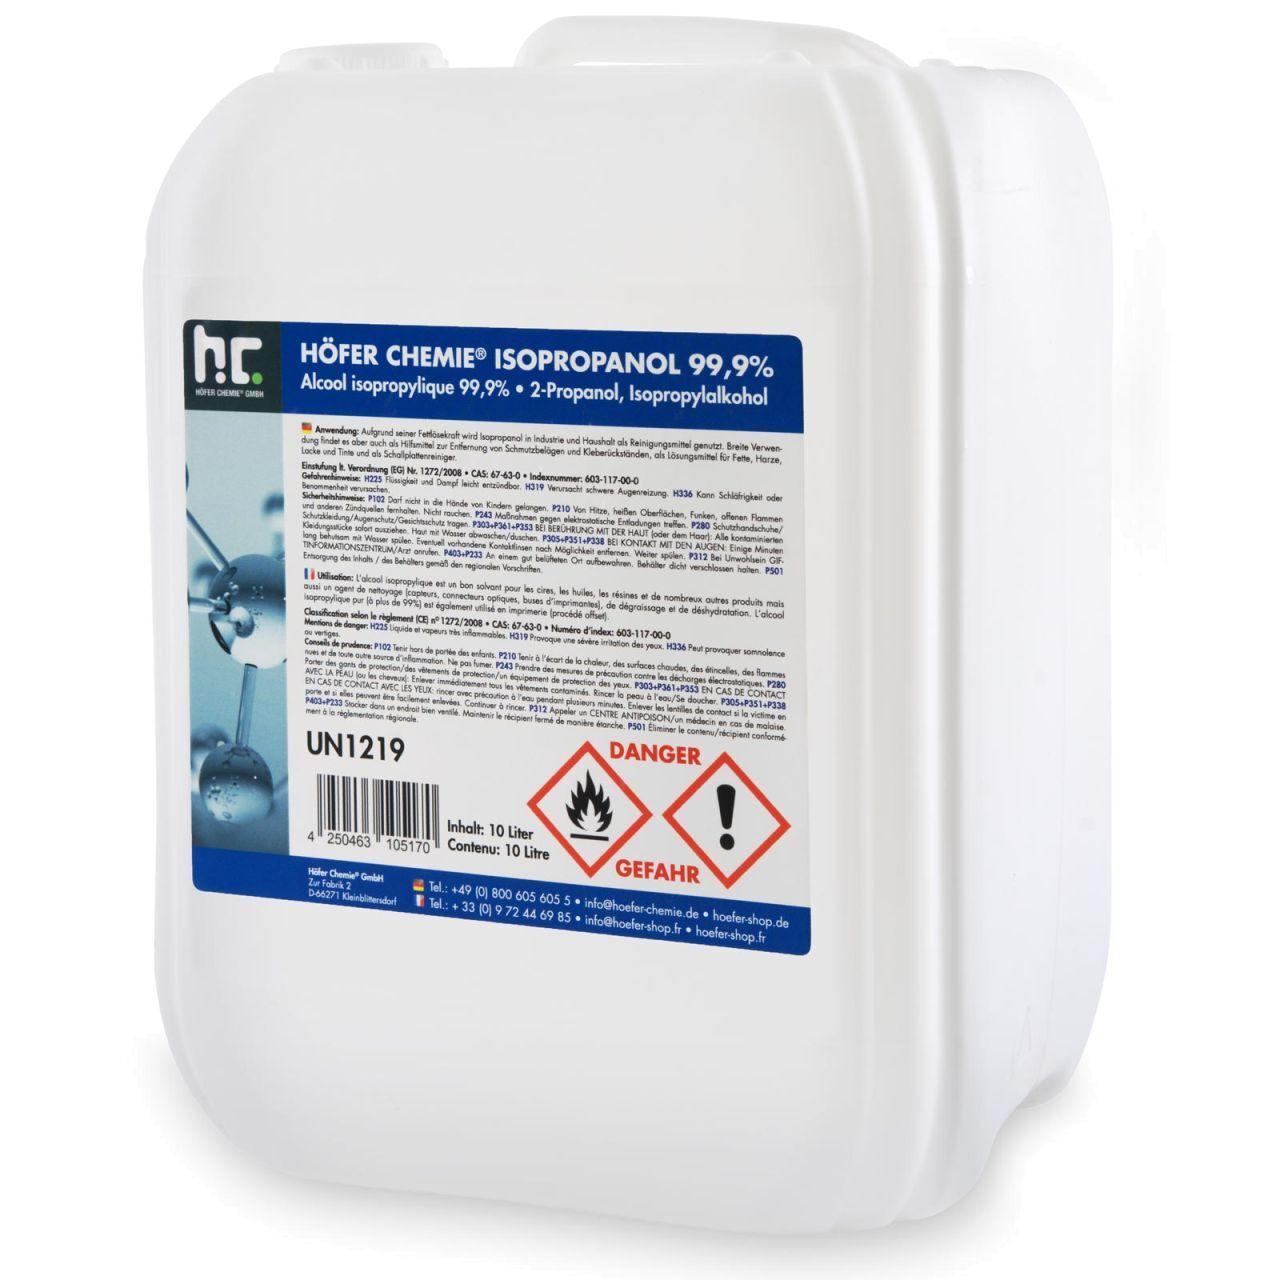 Höfer Chemie 20 l Alcool isopropylique 99,9 % (2 x 10 l)